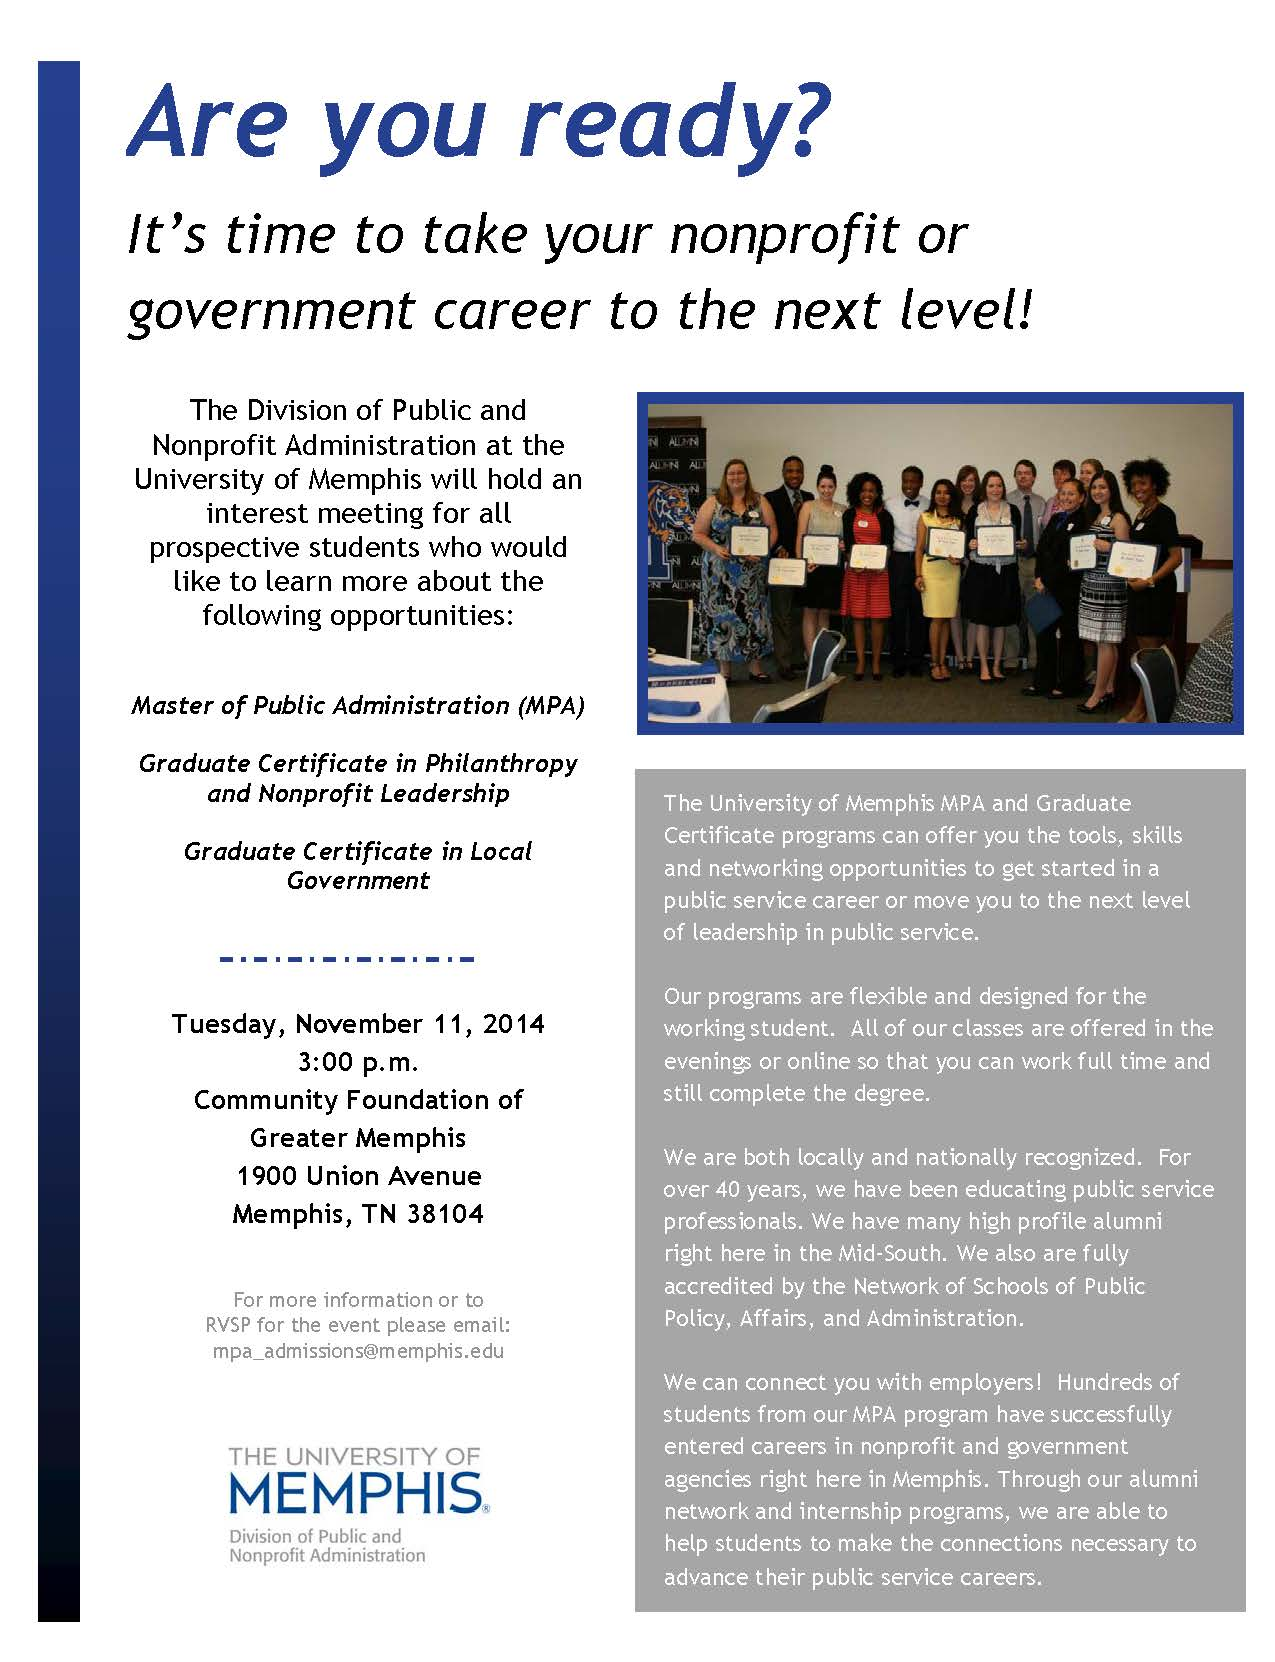 PADM Interest Meeting Flyer | Virtual Career Center